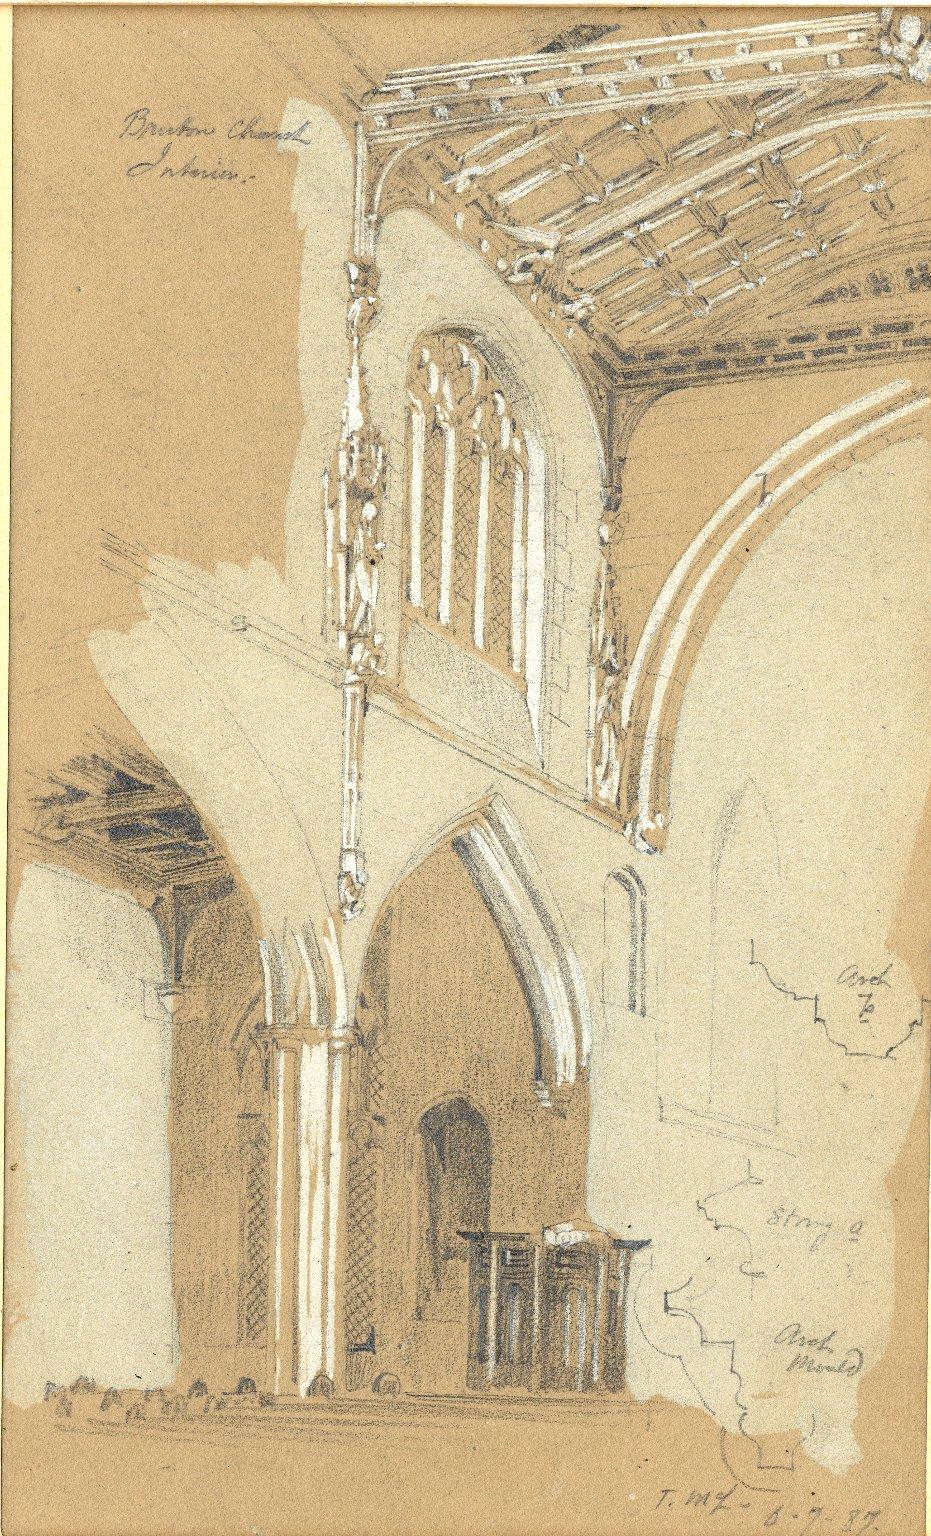 Interior of Bruton Church